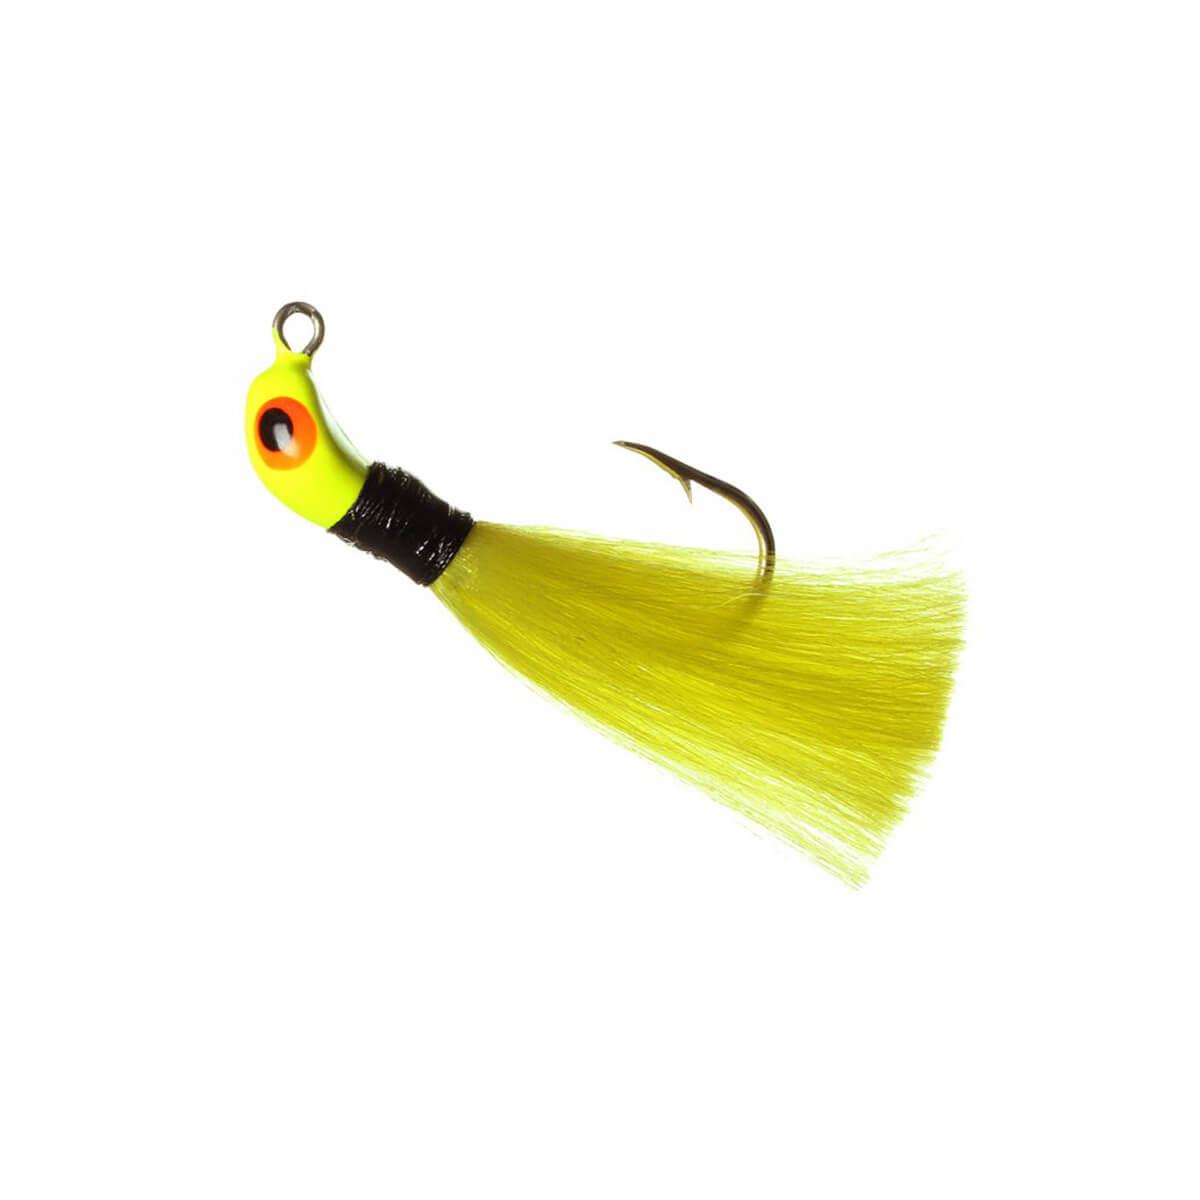 Jig Lori Tamanho M 12 g  - Pró Pesca Shop